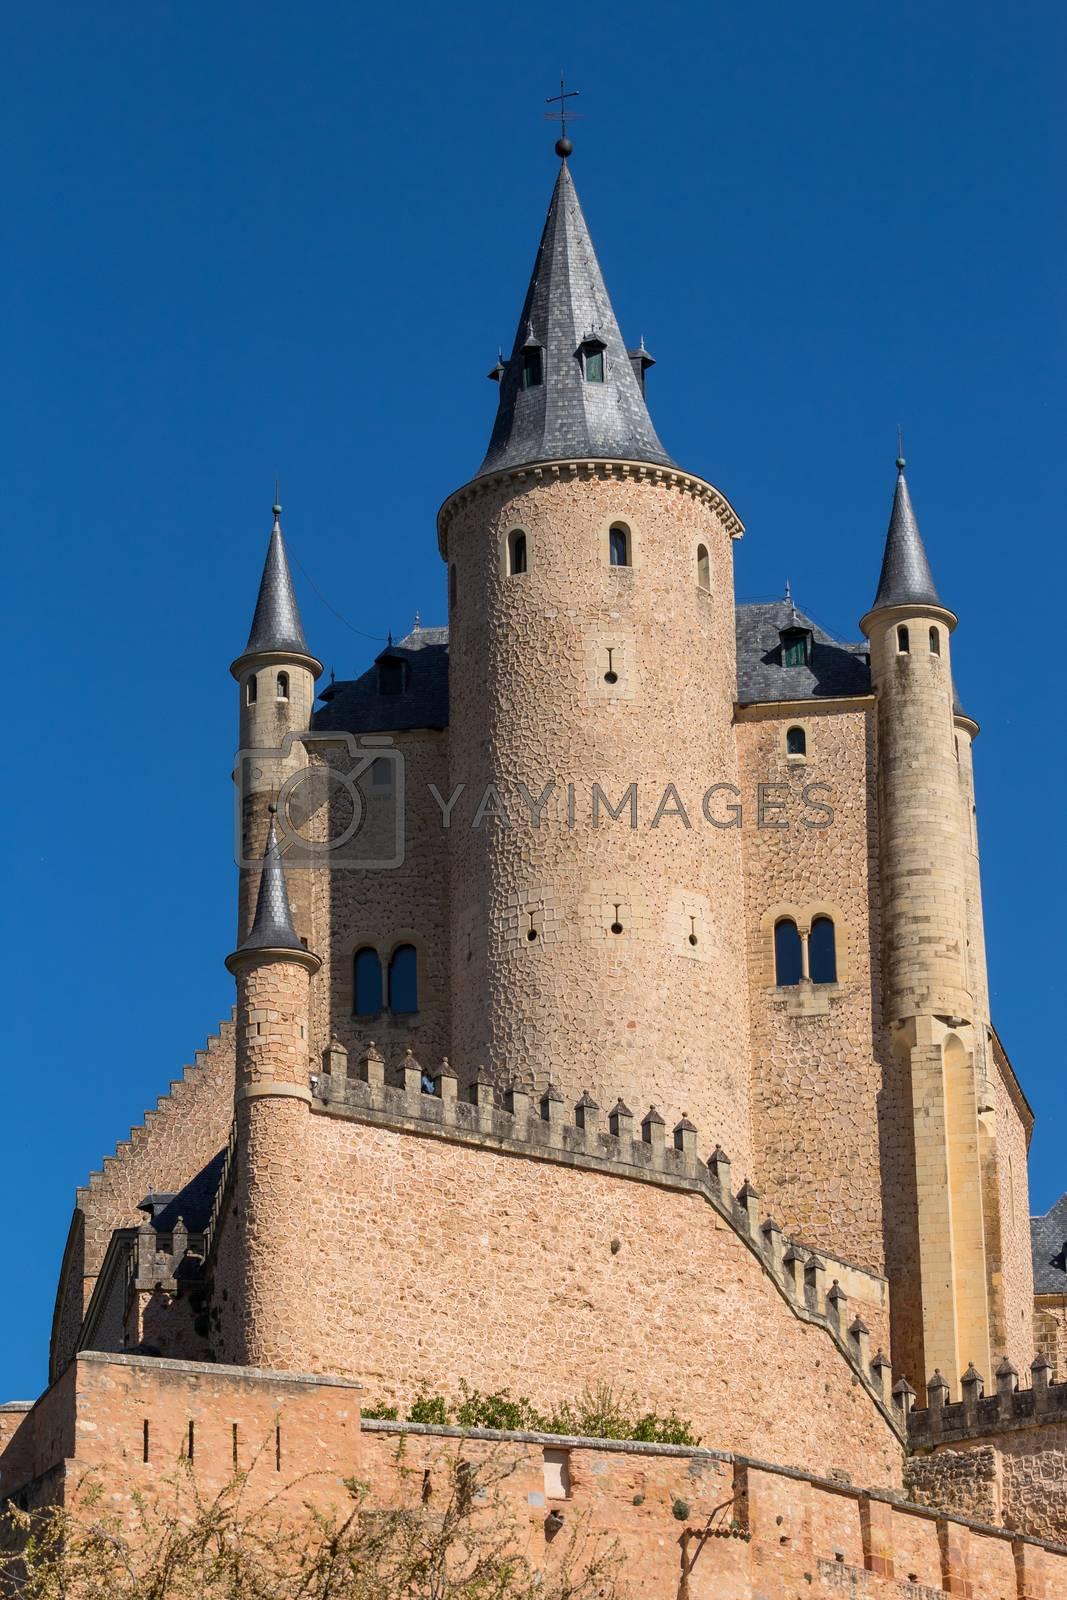 The famous Alcazar castle of Segovia, Castilla y Leon, Spain